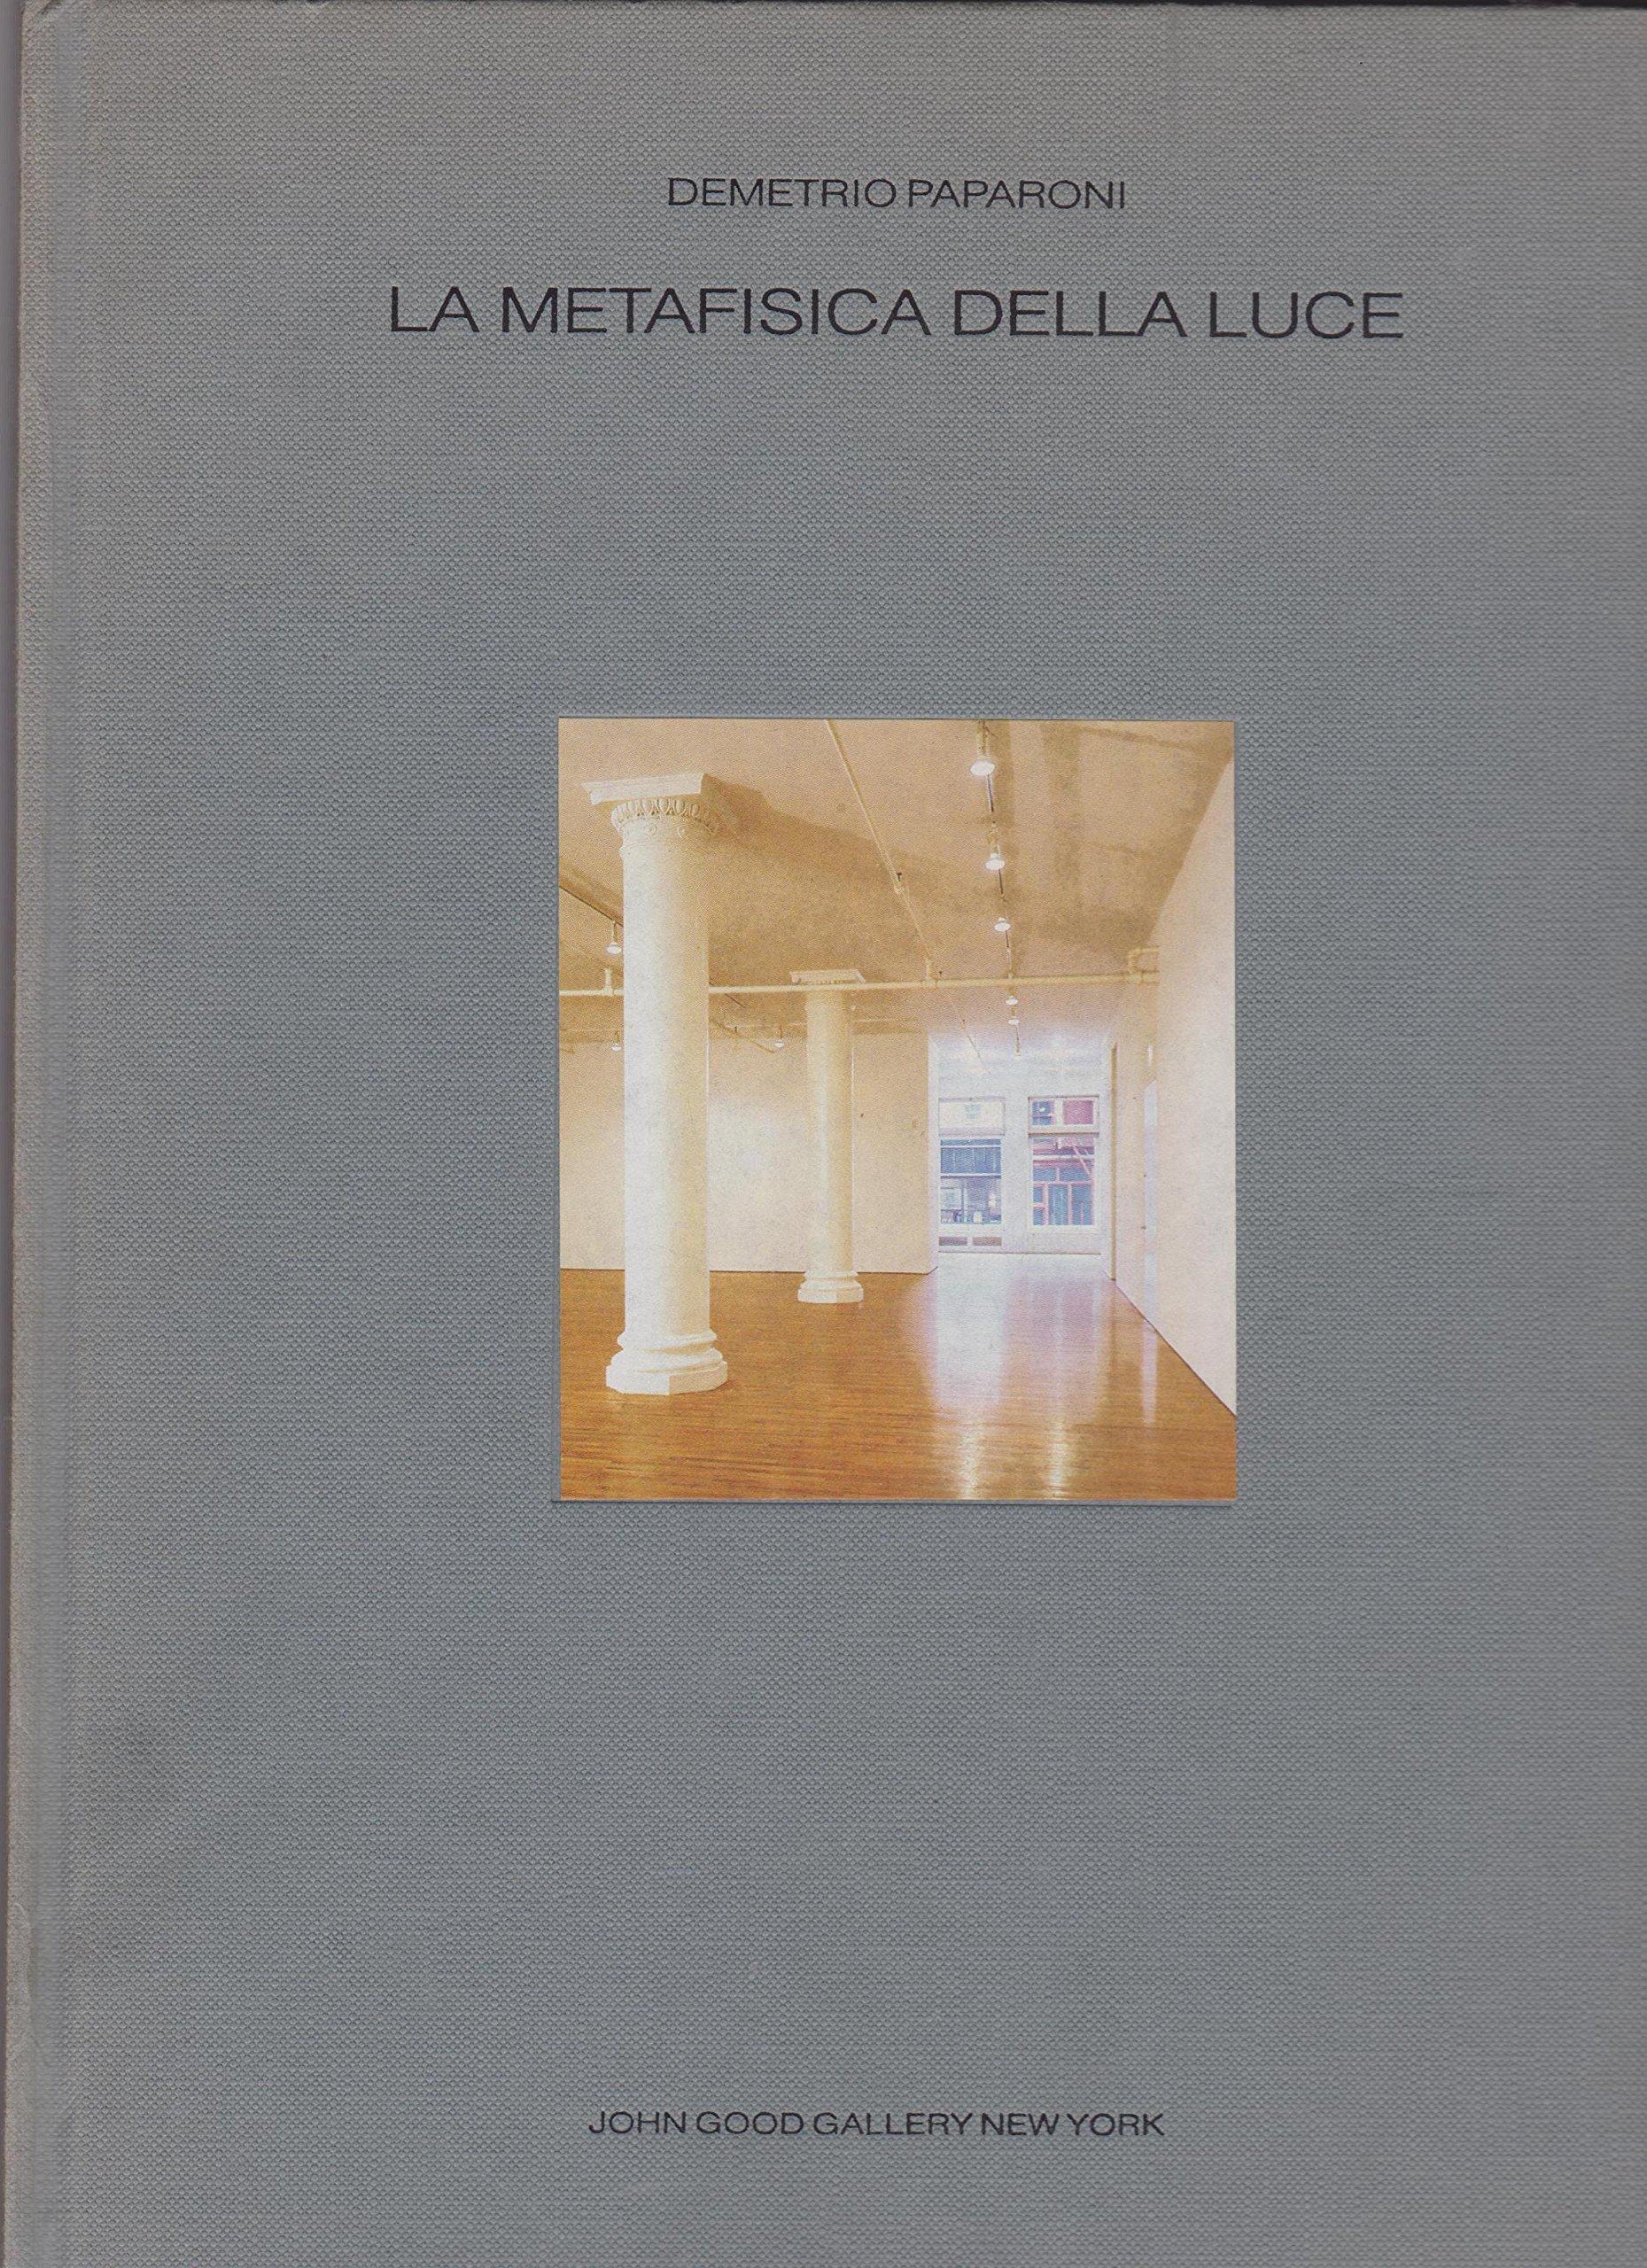 LA METAFISICA DELLA LUCE / John Good Gallery / New York 1993